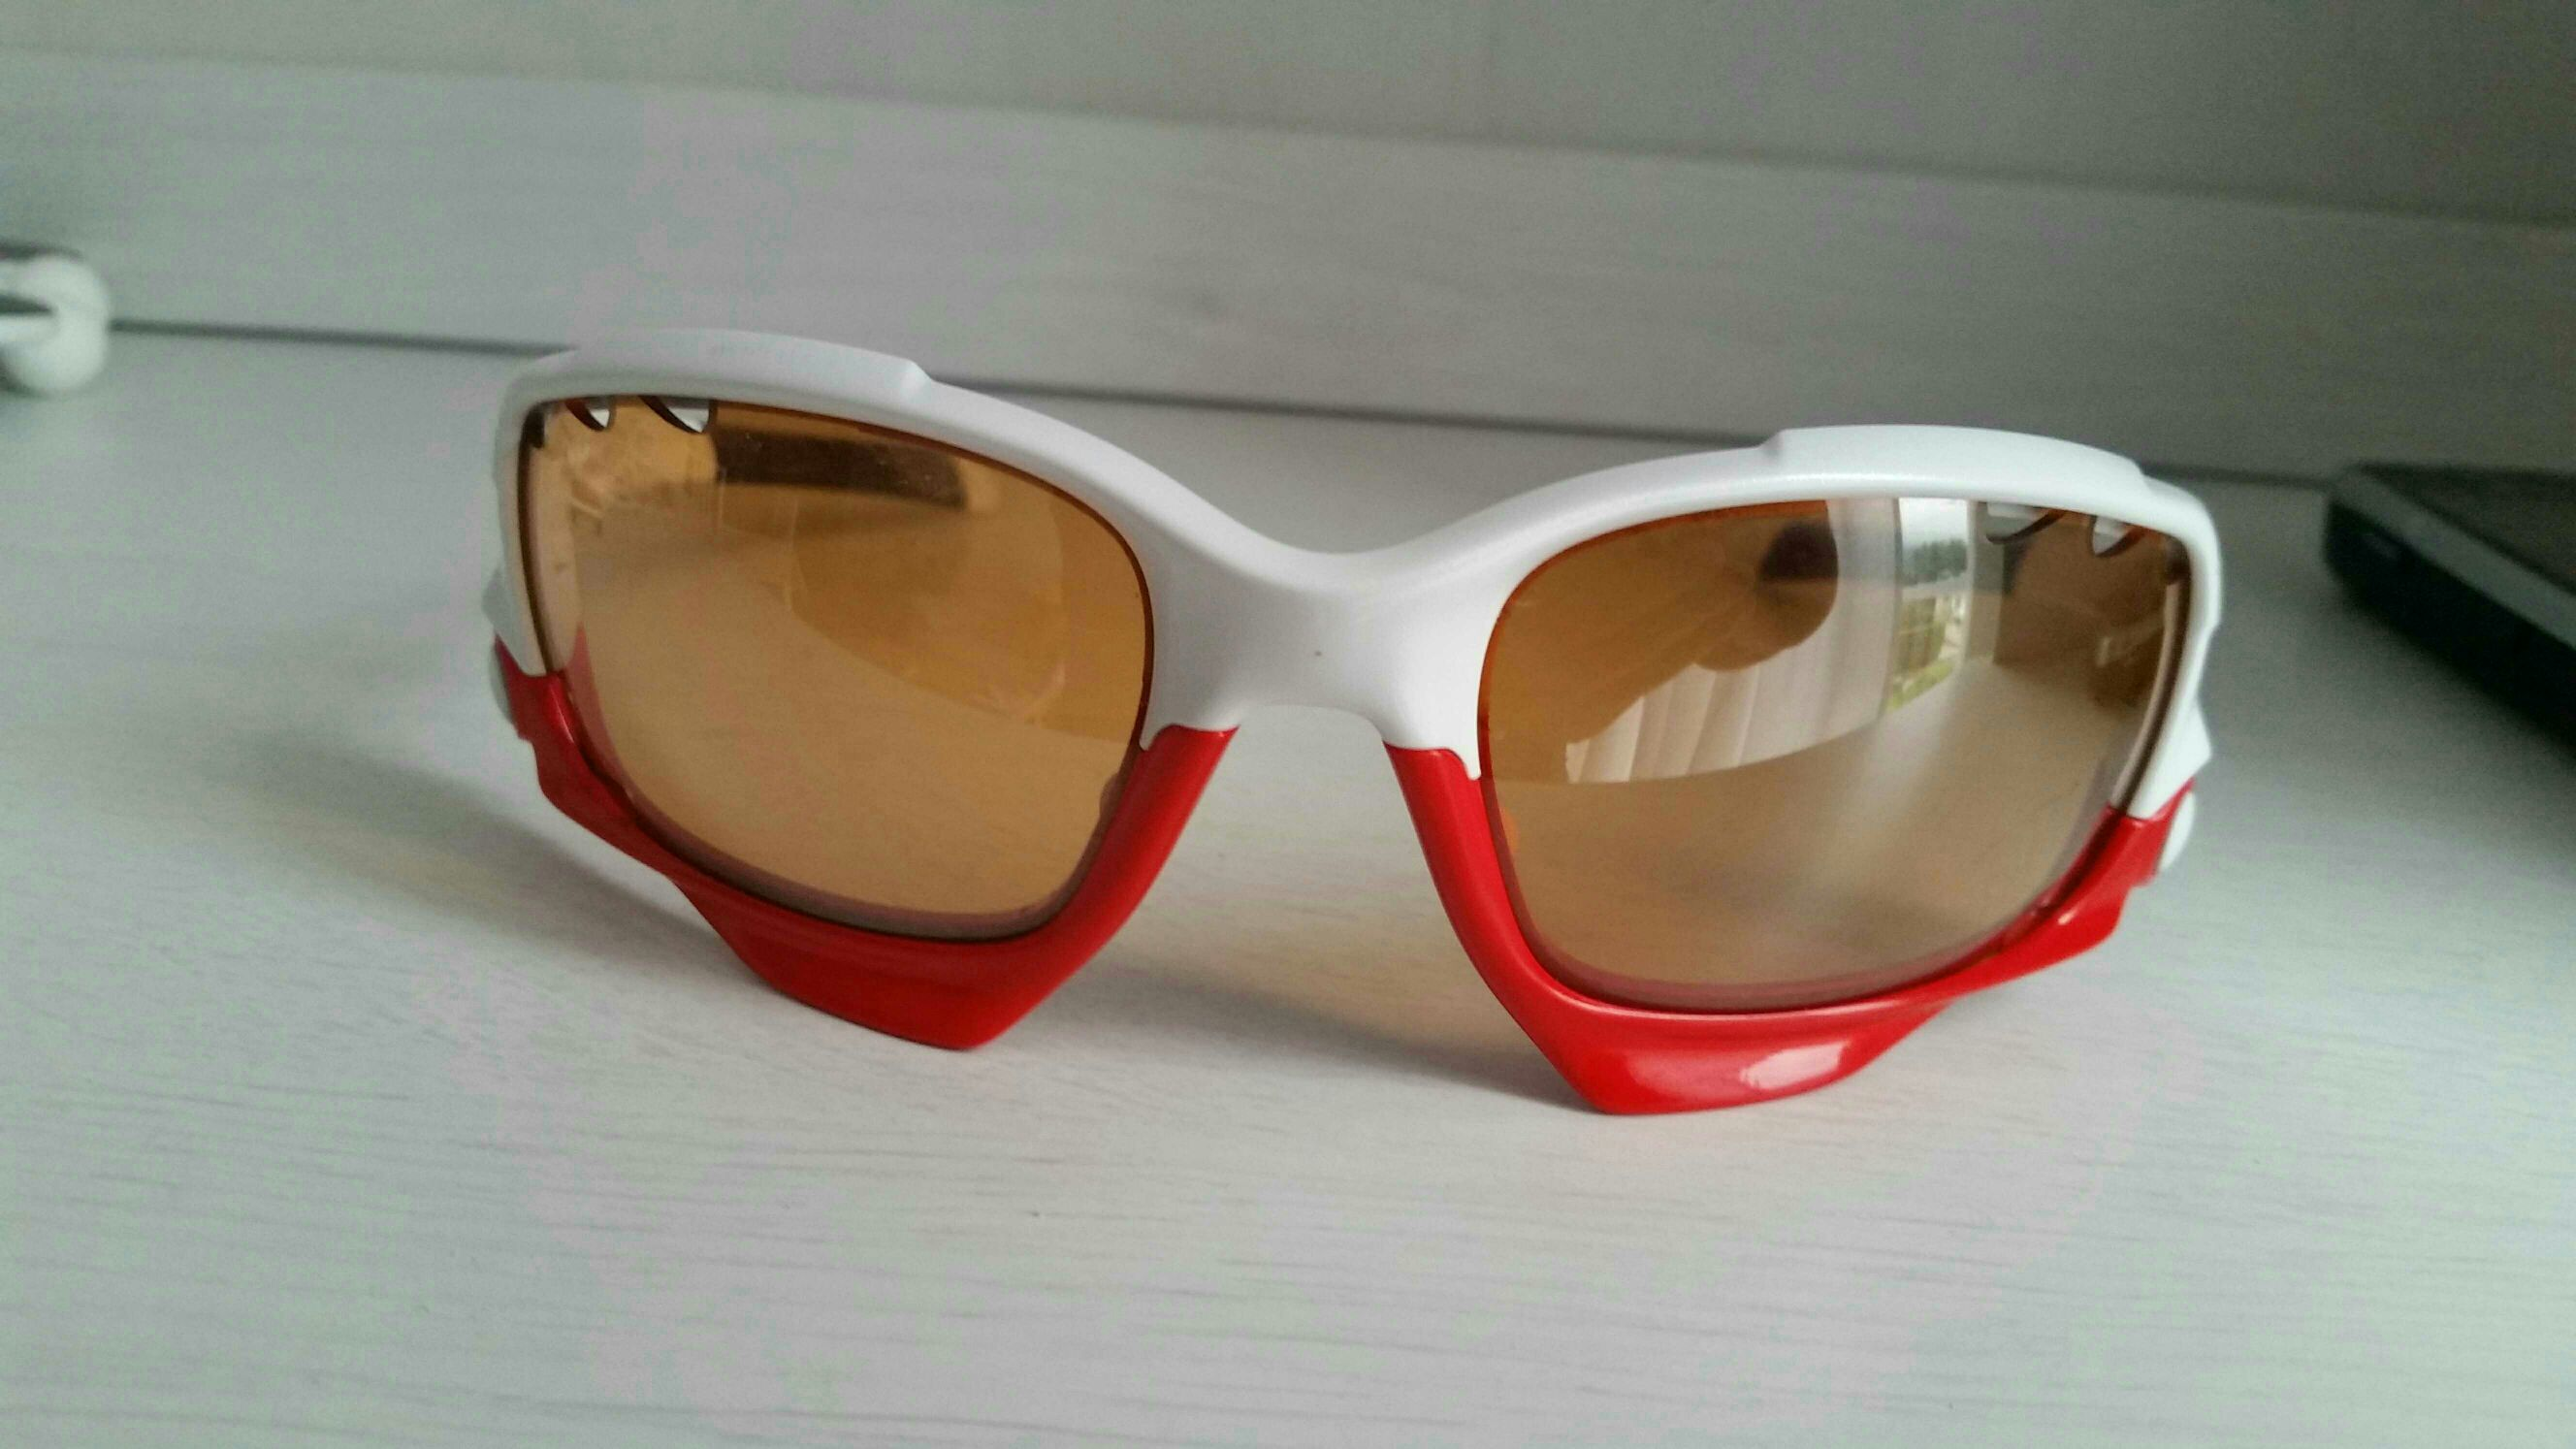 b22295eb06 Repuestos Gafas Oakley « One More Soul